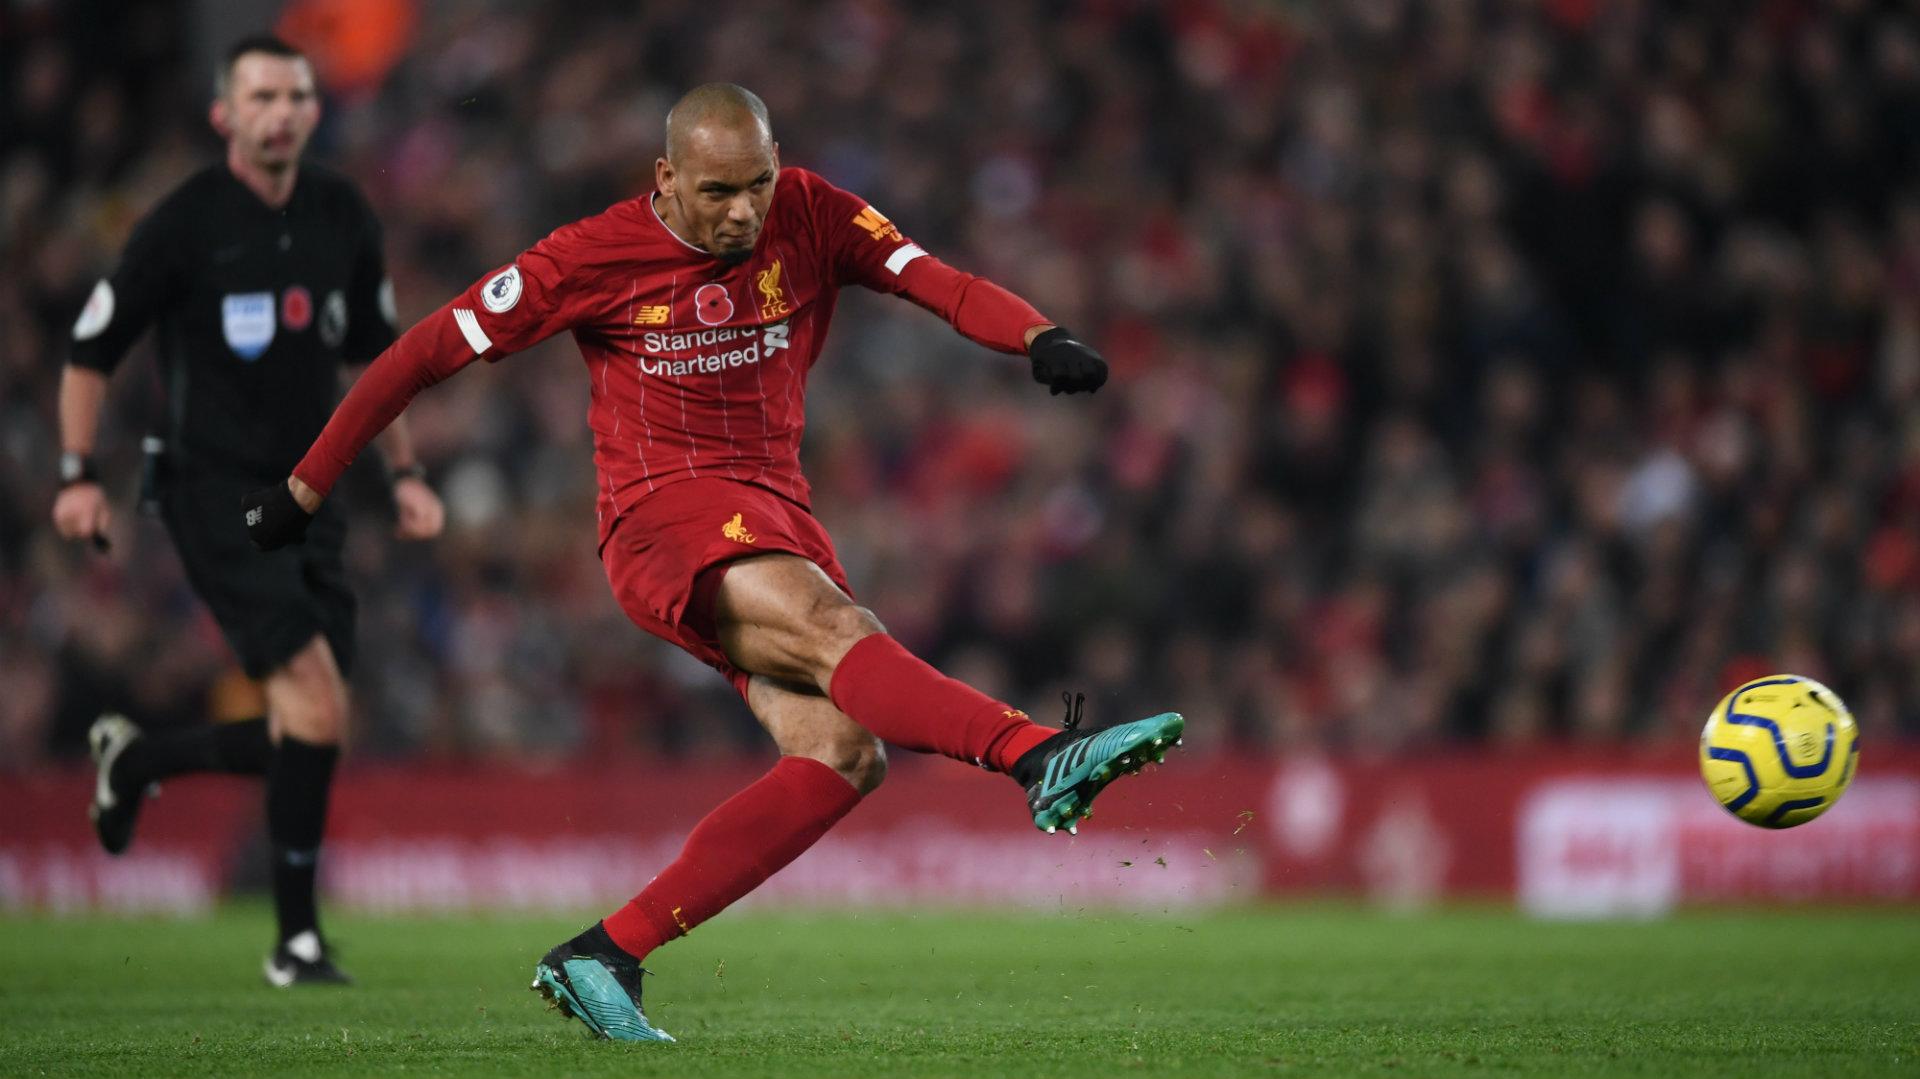 Fabinho Liverpool vs Man City 2019-20